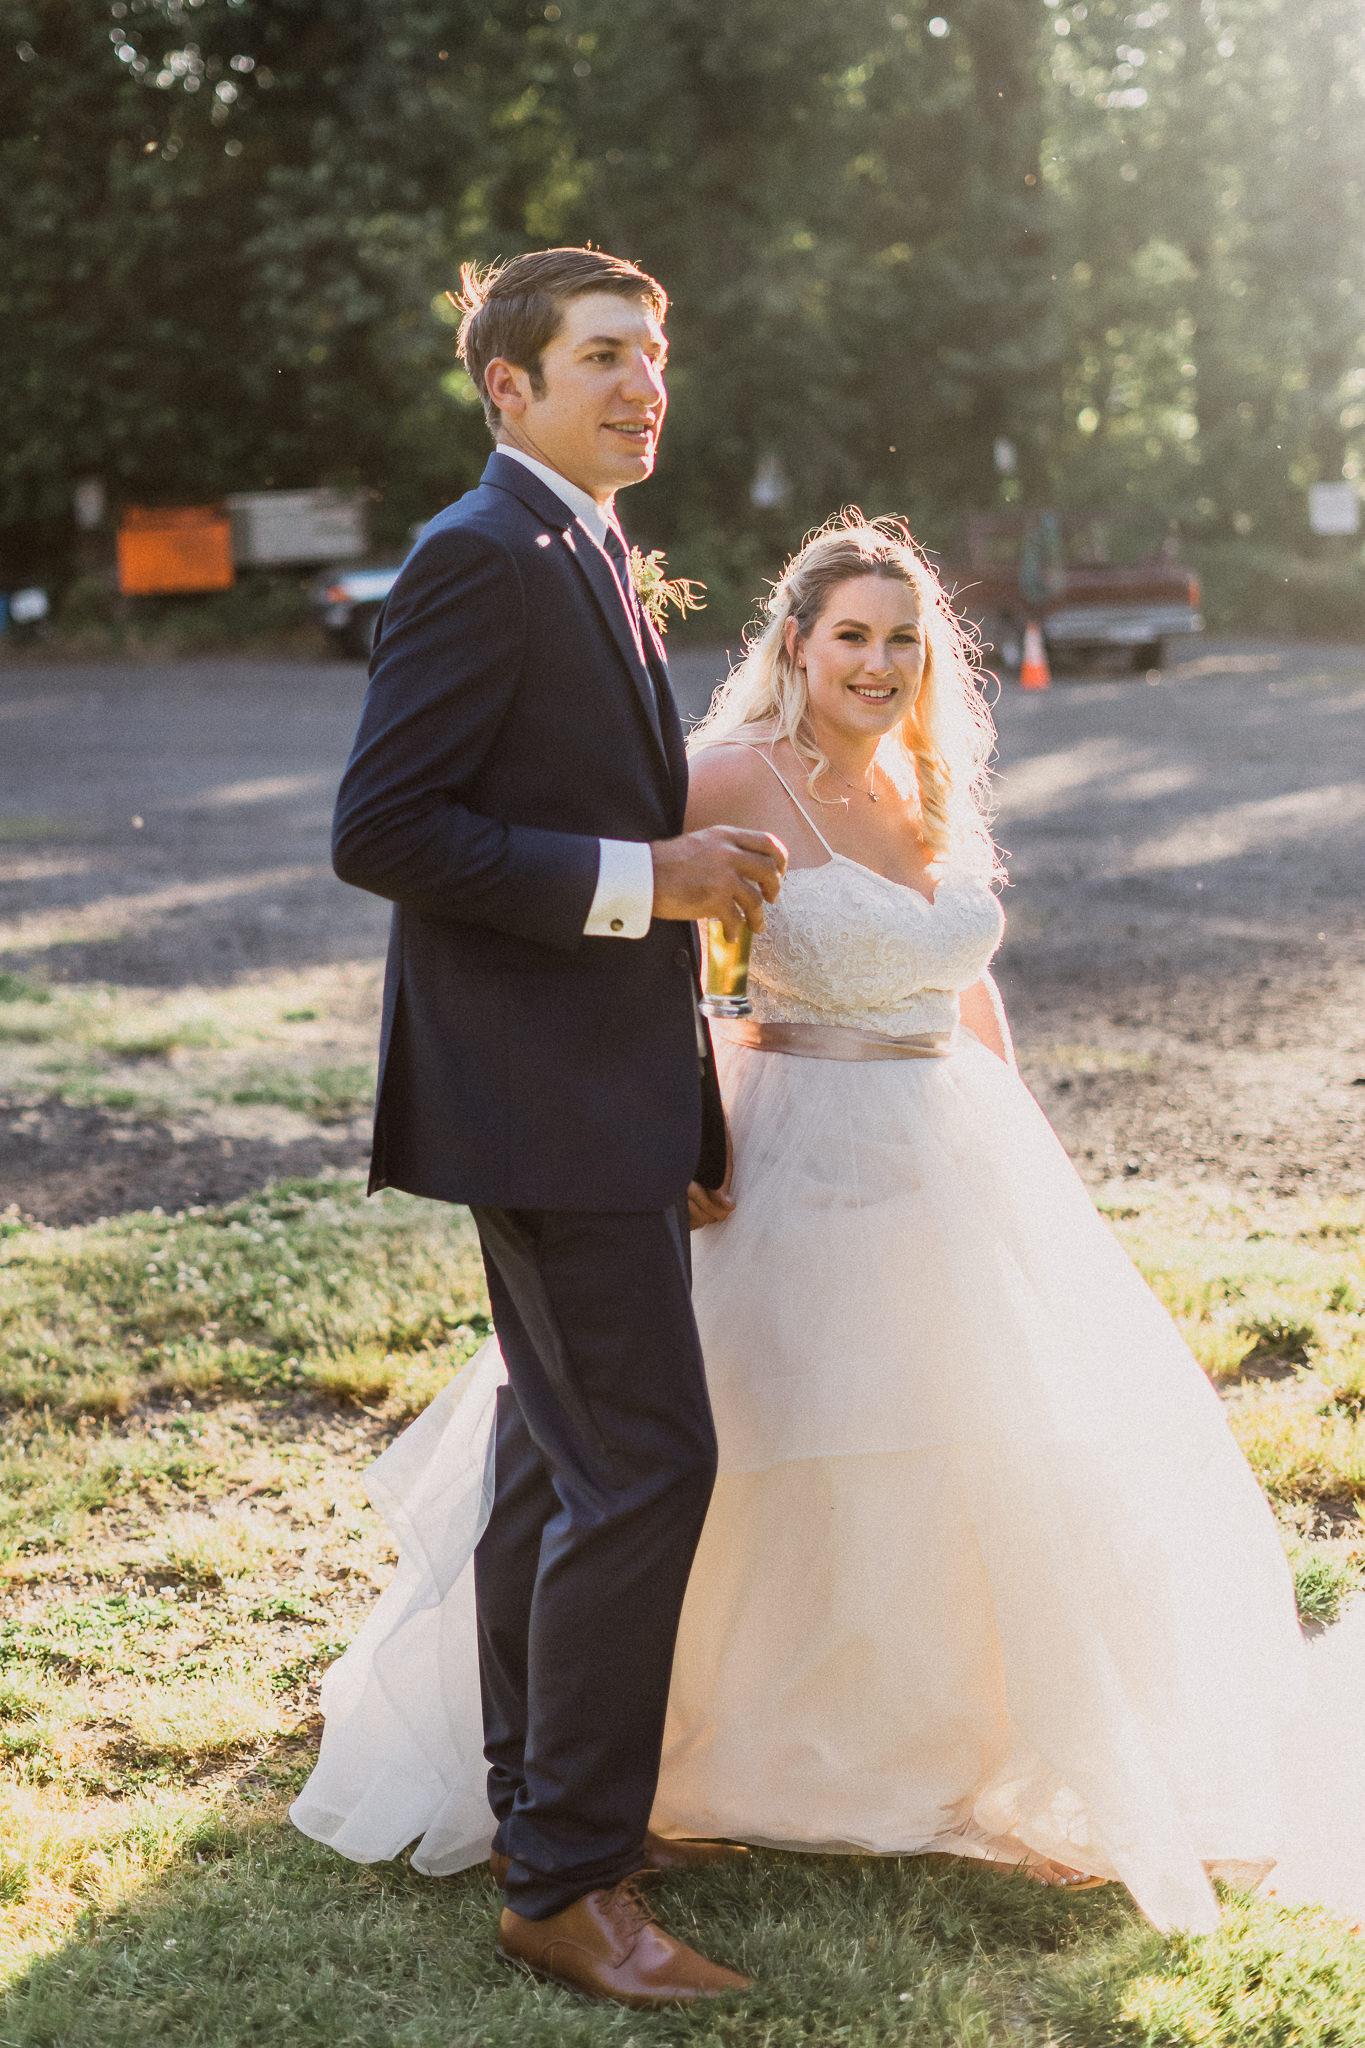 grand entrance wedding backyard Columbia River Gorge oregon wedding